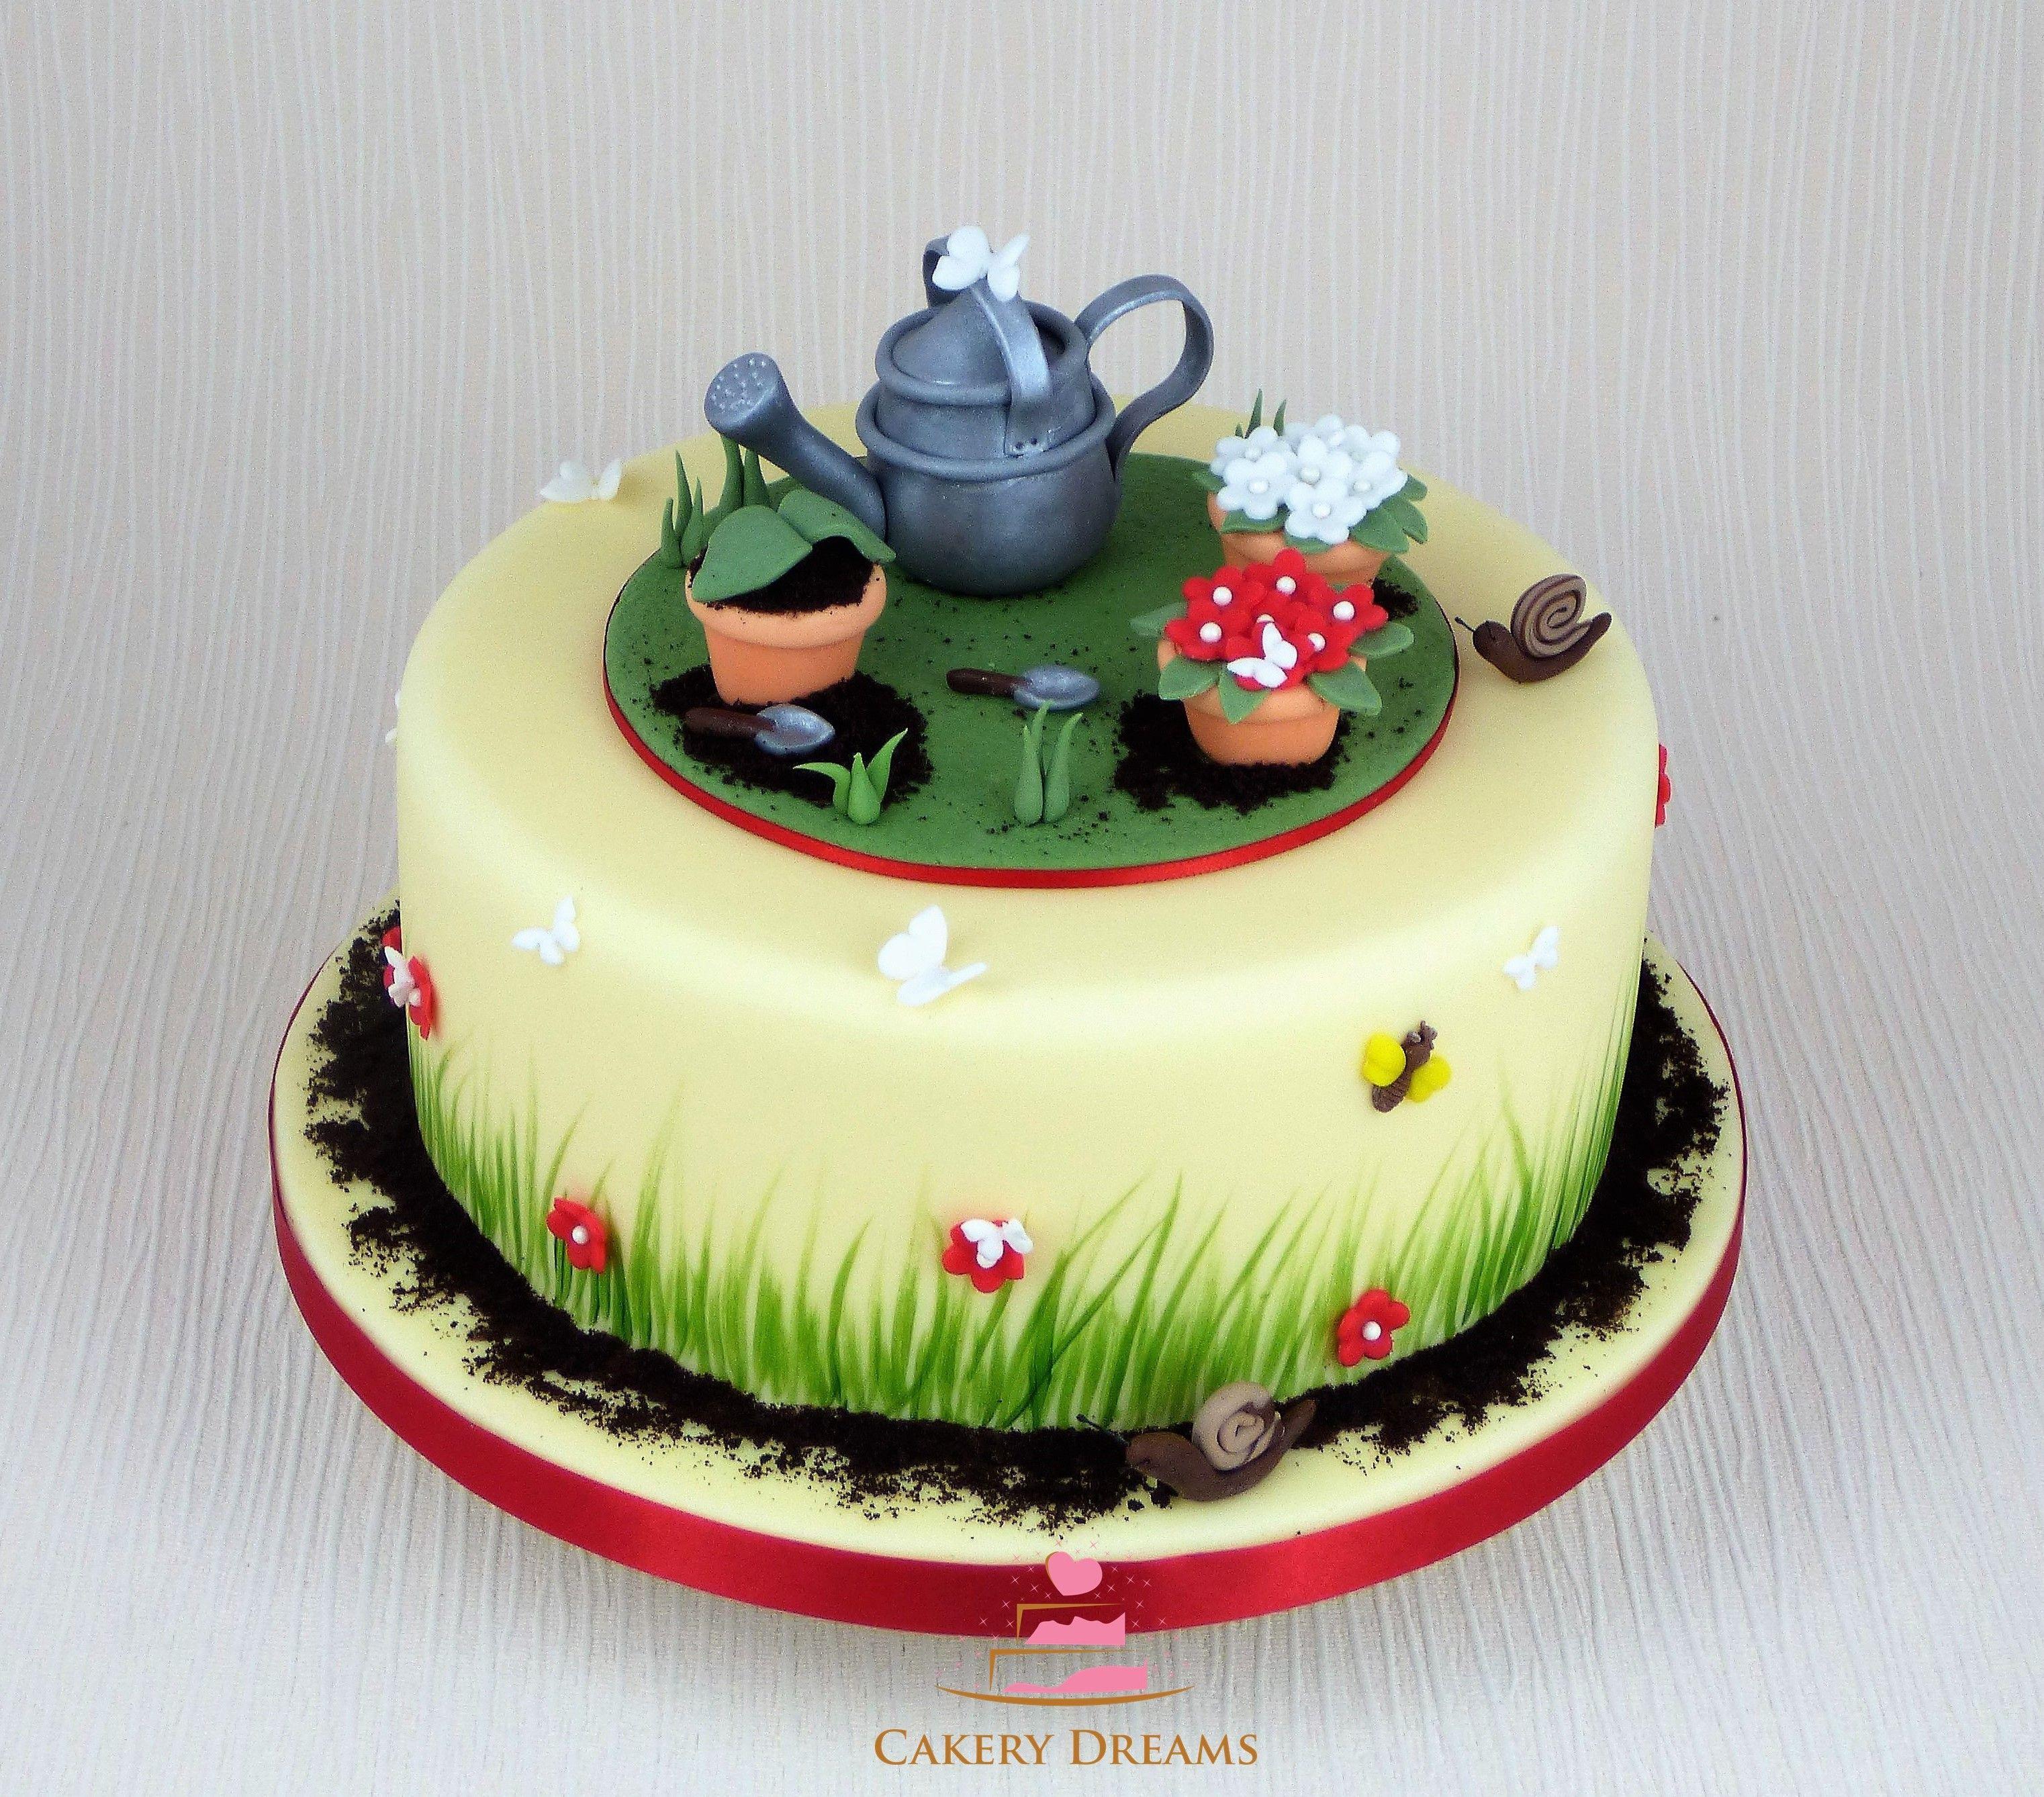 Fondant Torte Zum Thema Fruhling Im Garten Cake Spring Garden Garten Fondant Torten Fruhling Fondant Torten Fruhlings Torte Kuchen Mit Fondant